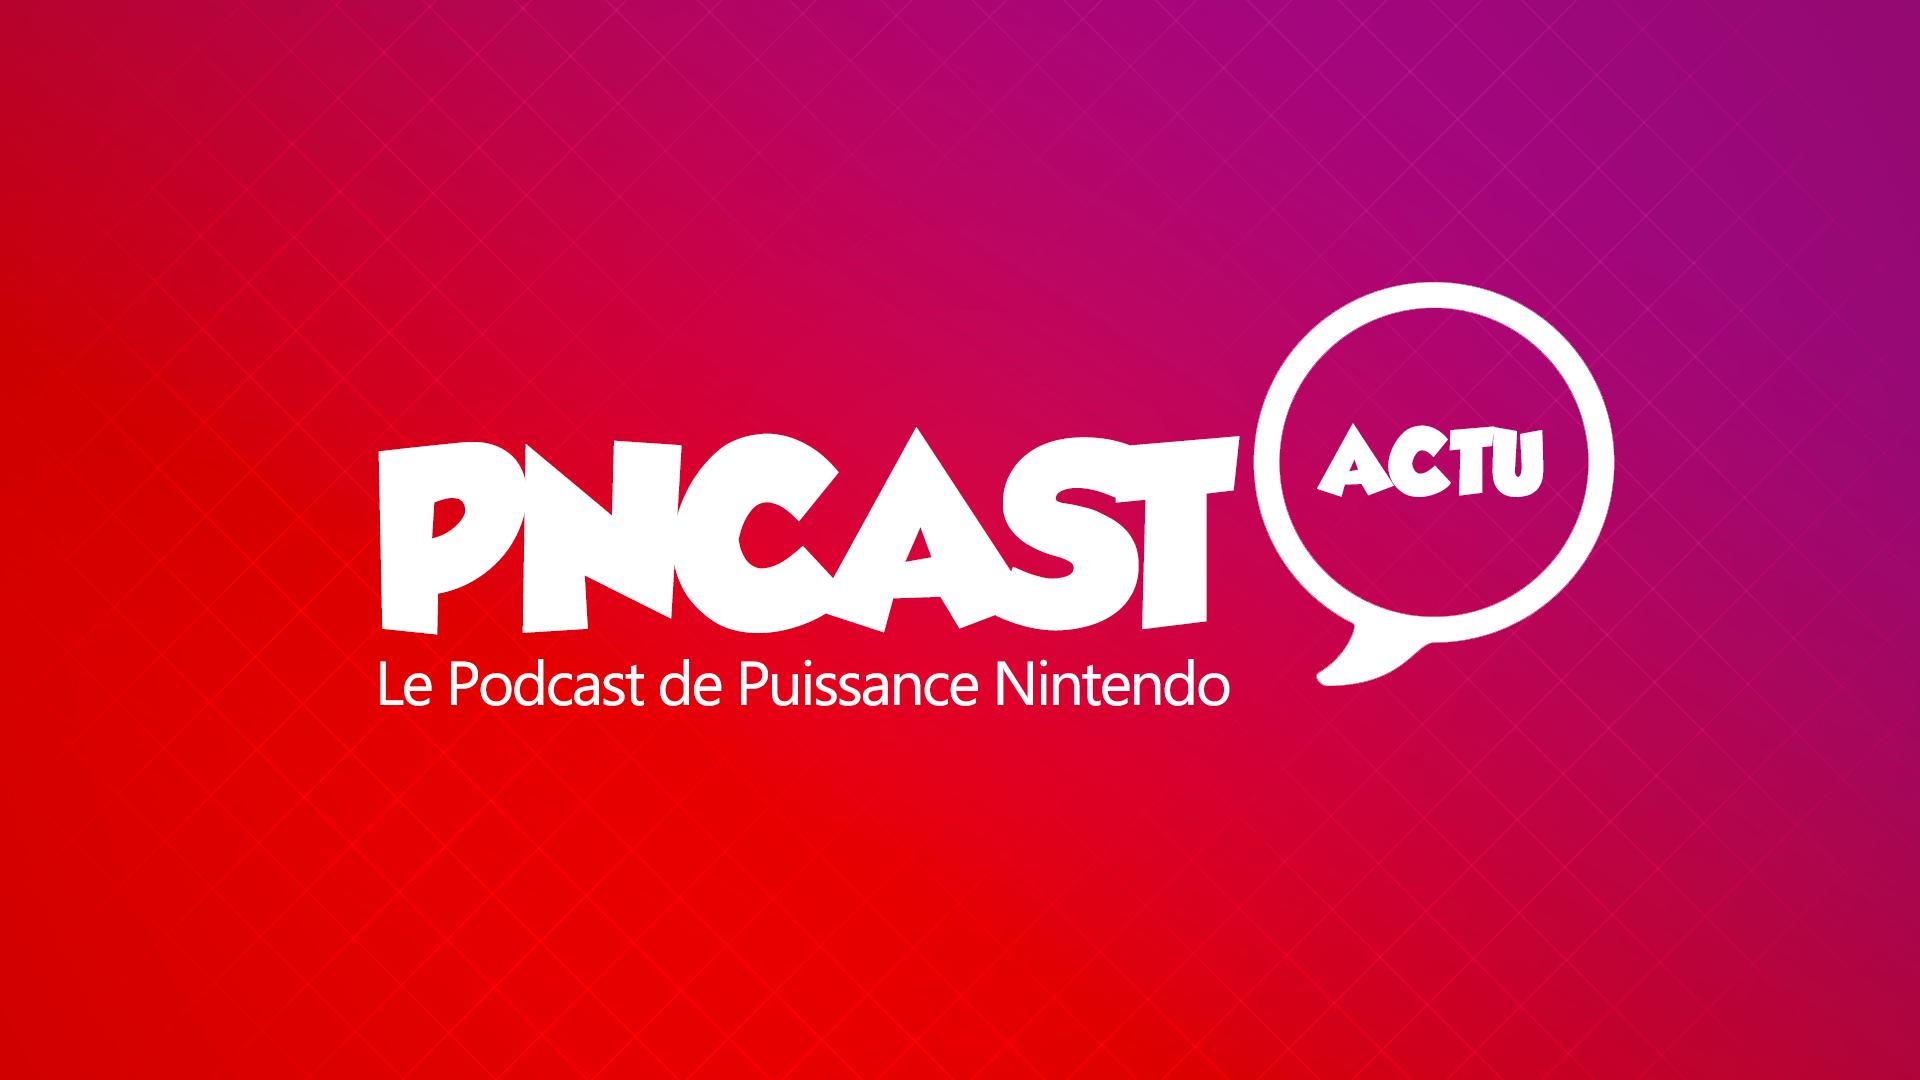 Logo PNCAST ACTU